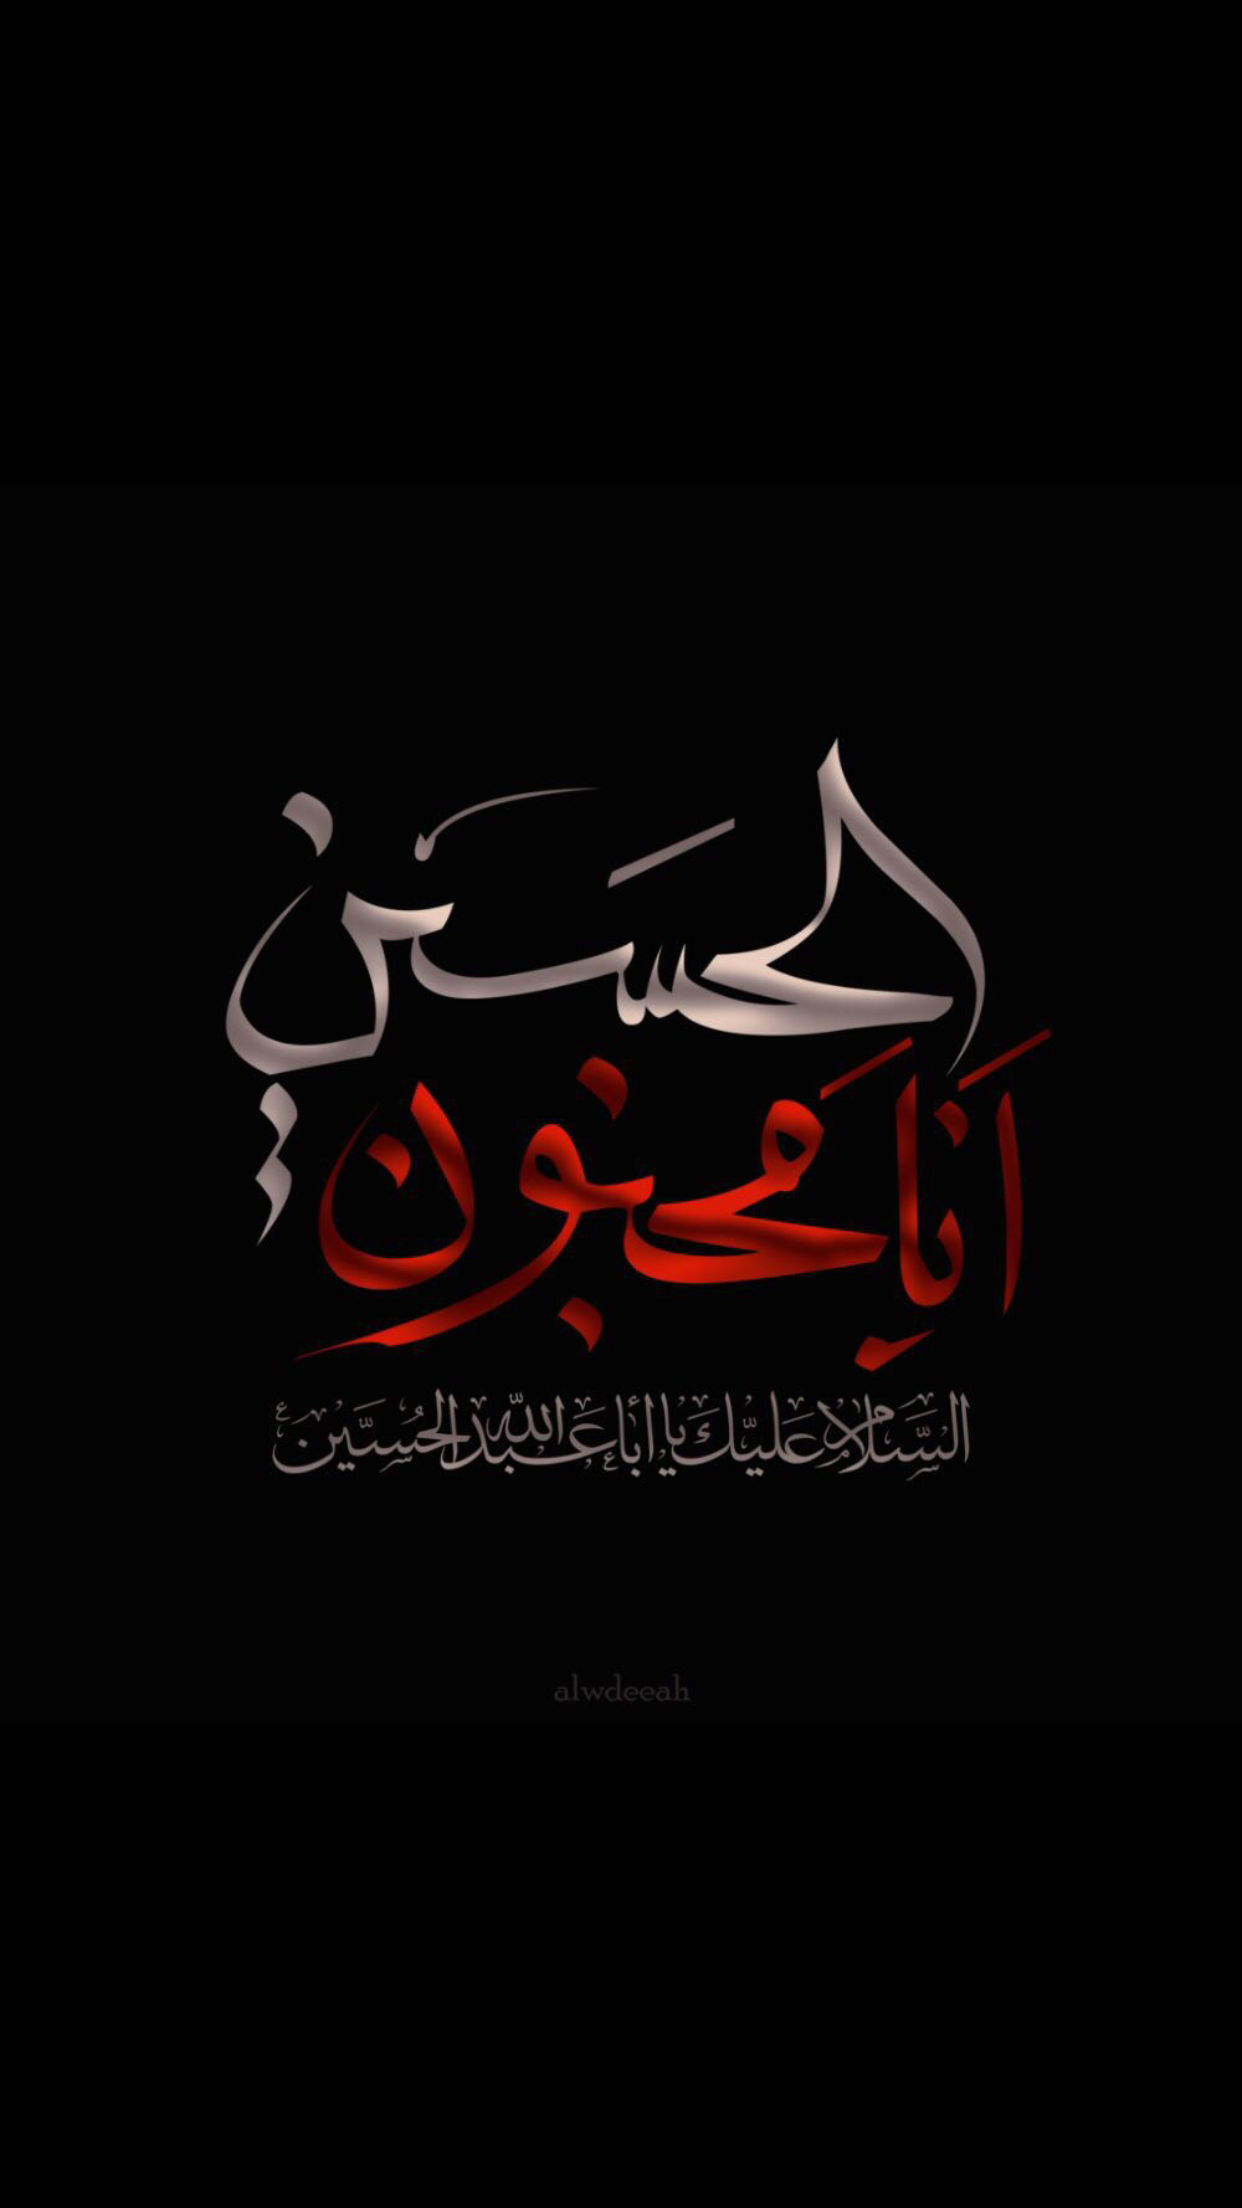 Sukut U Lisan Selameti Insan Imam Hussain Wallpapers Imam Hussain Karbala Hussain Karbala